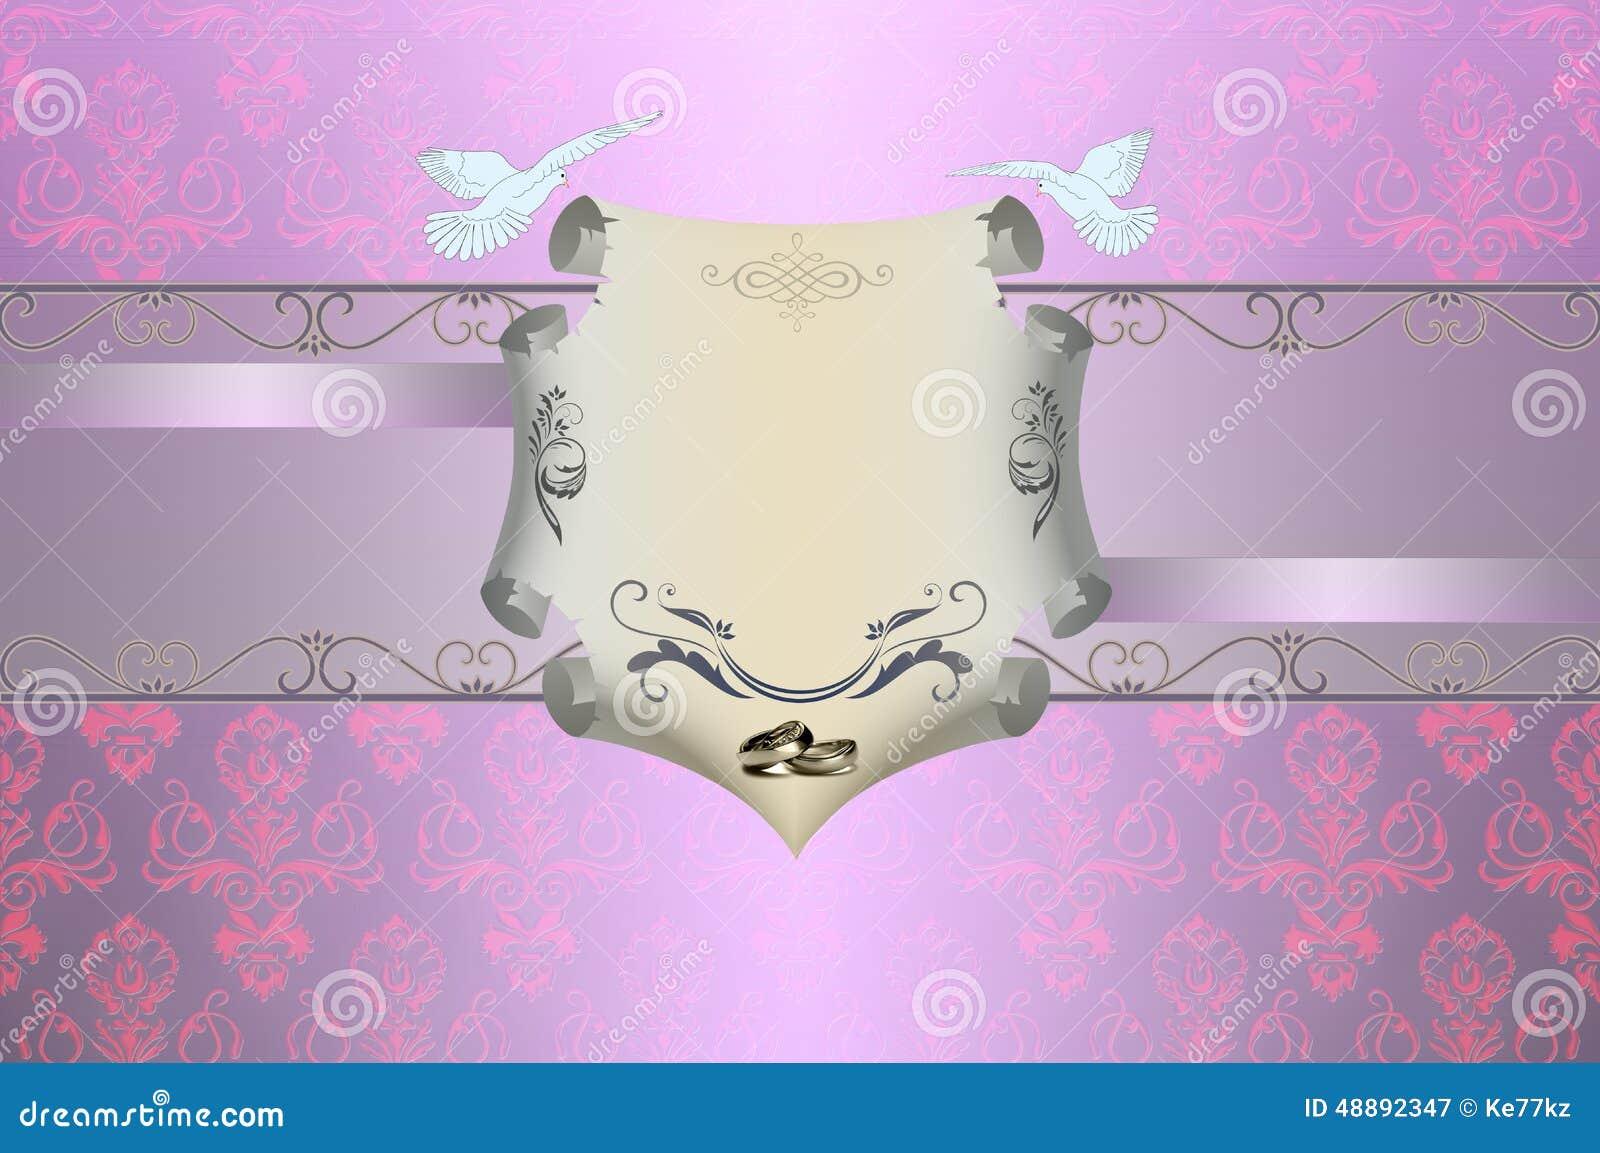 Wedding invitation template. Royalty-Free Illustration